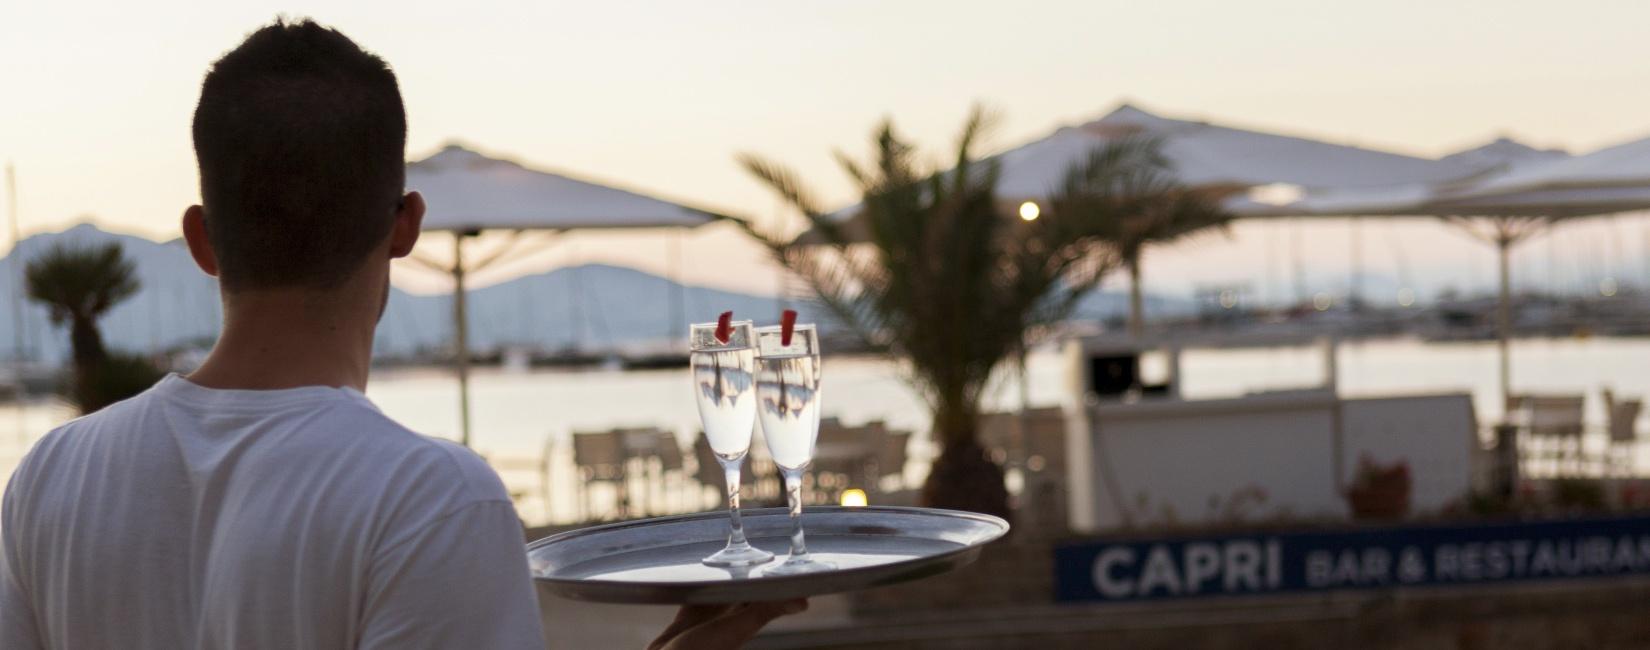 pollensa Hotel Capri